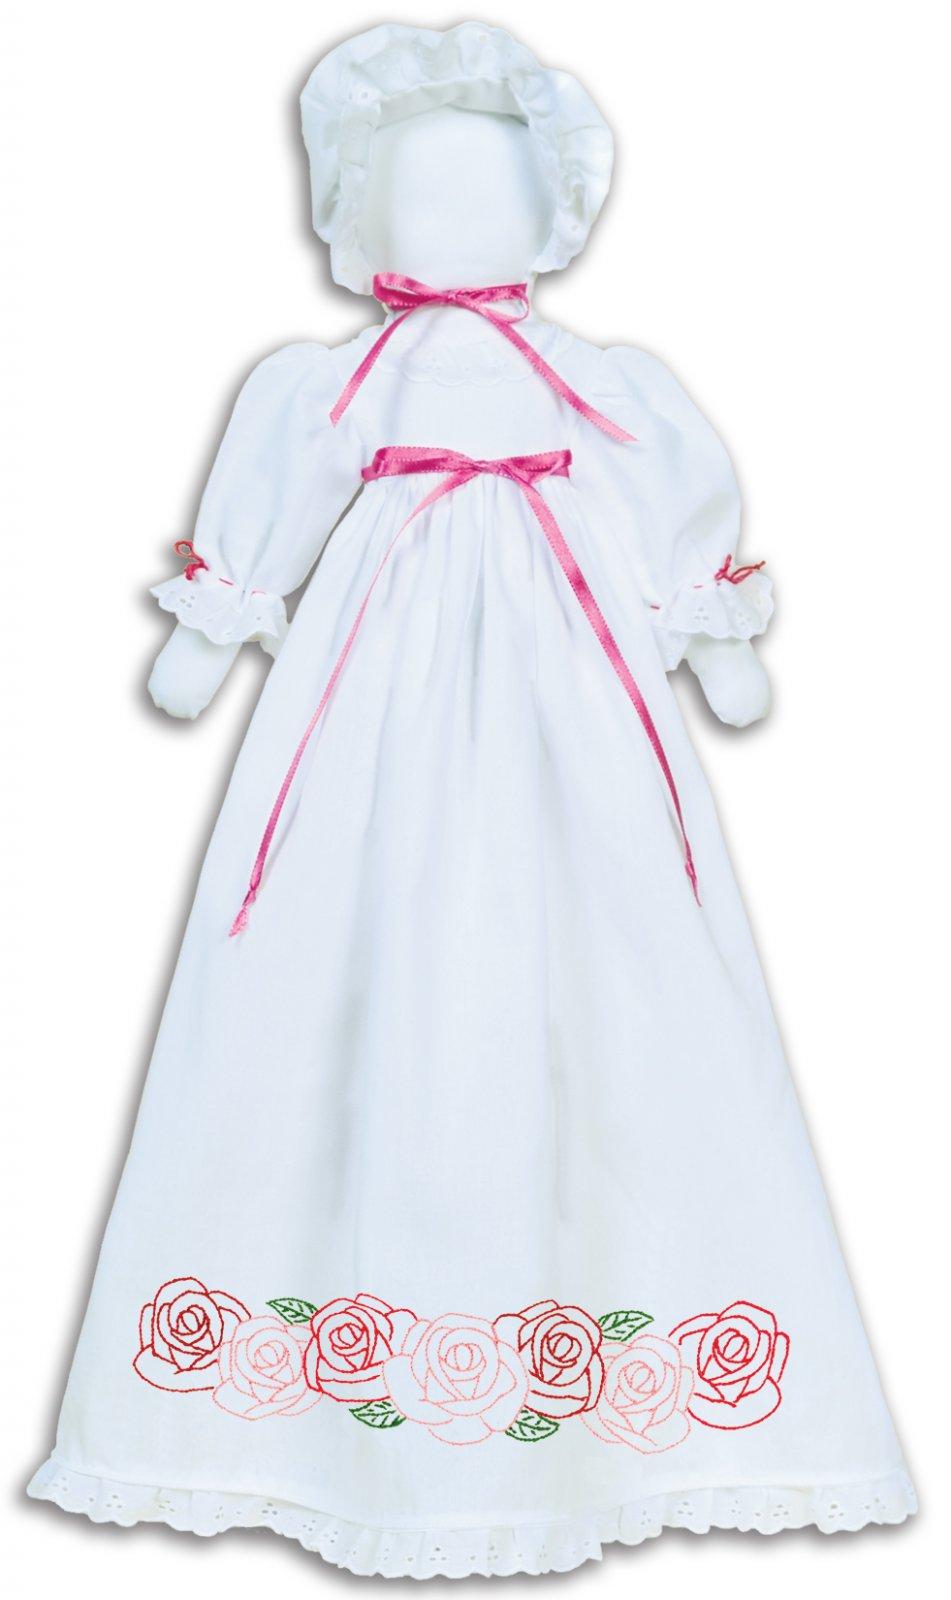 1900-PILLOWCASE DOLL KIT (Dress Bonnet Doll pieces)--0718